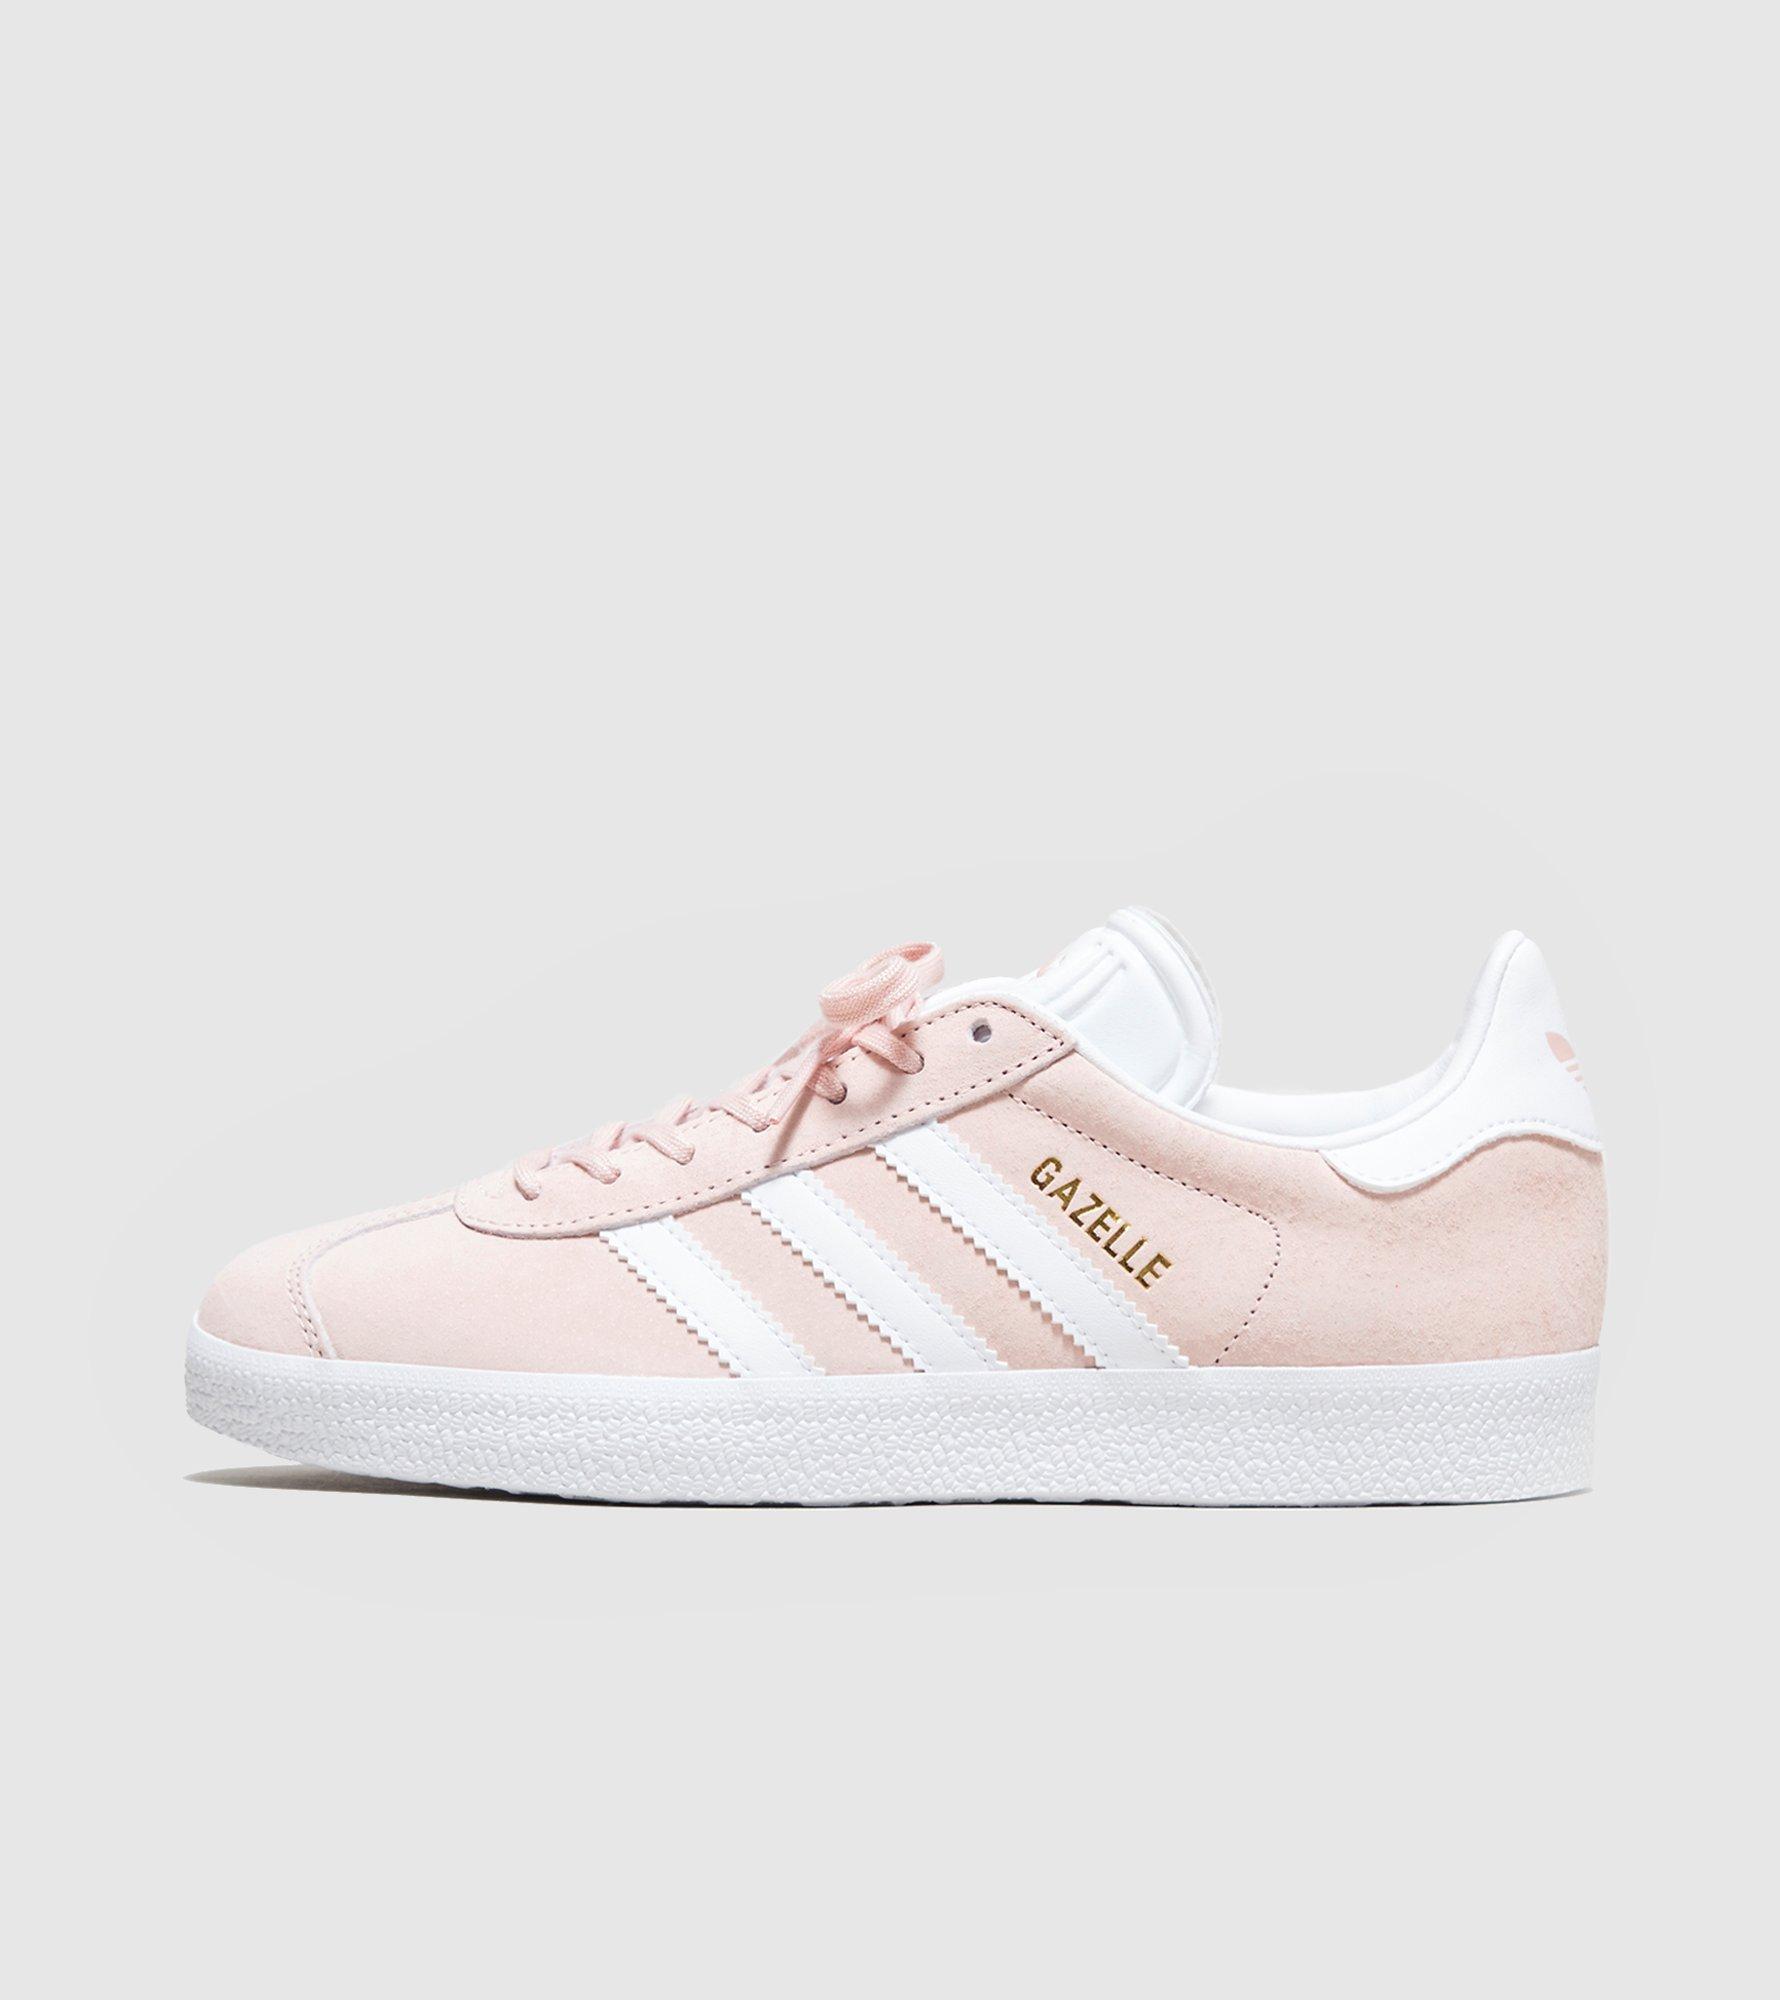 adidas gazelle blue pink adidas superstar women pink white stripes